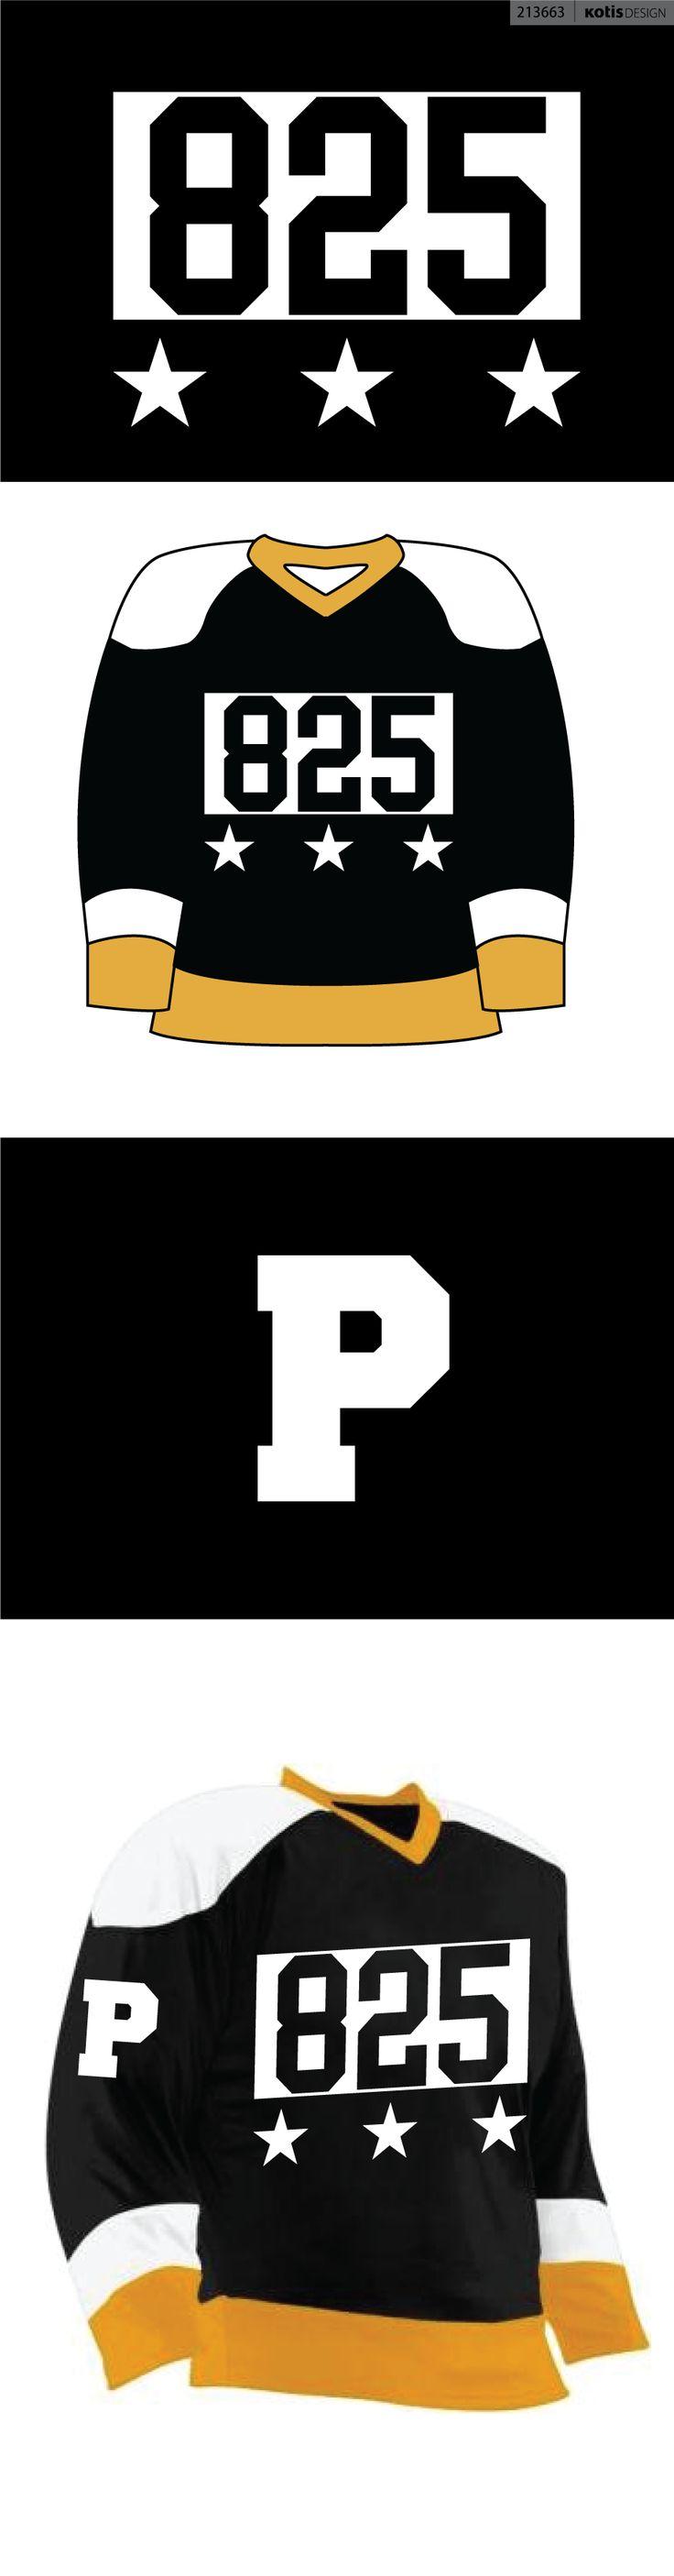 213663 purdue dz hockey jersey 17 view proof kotis design